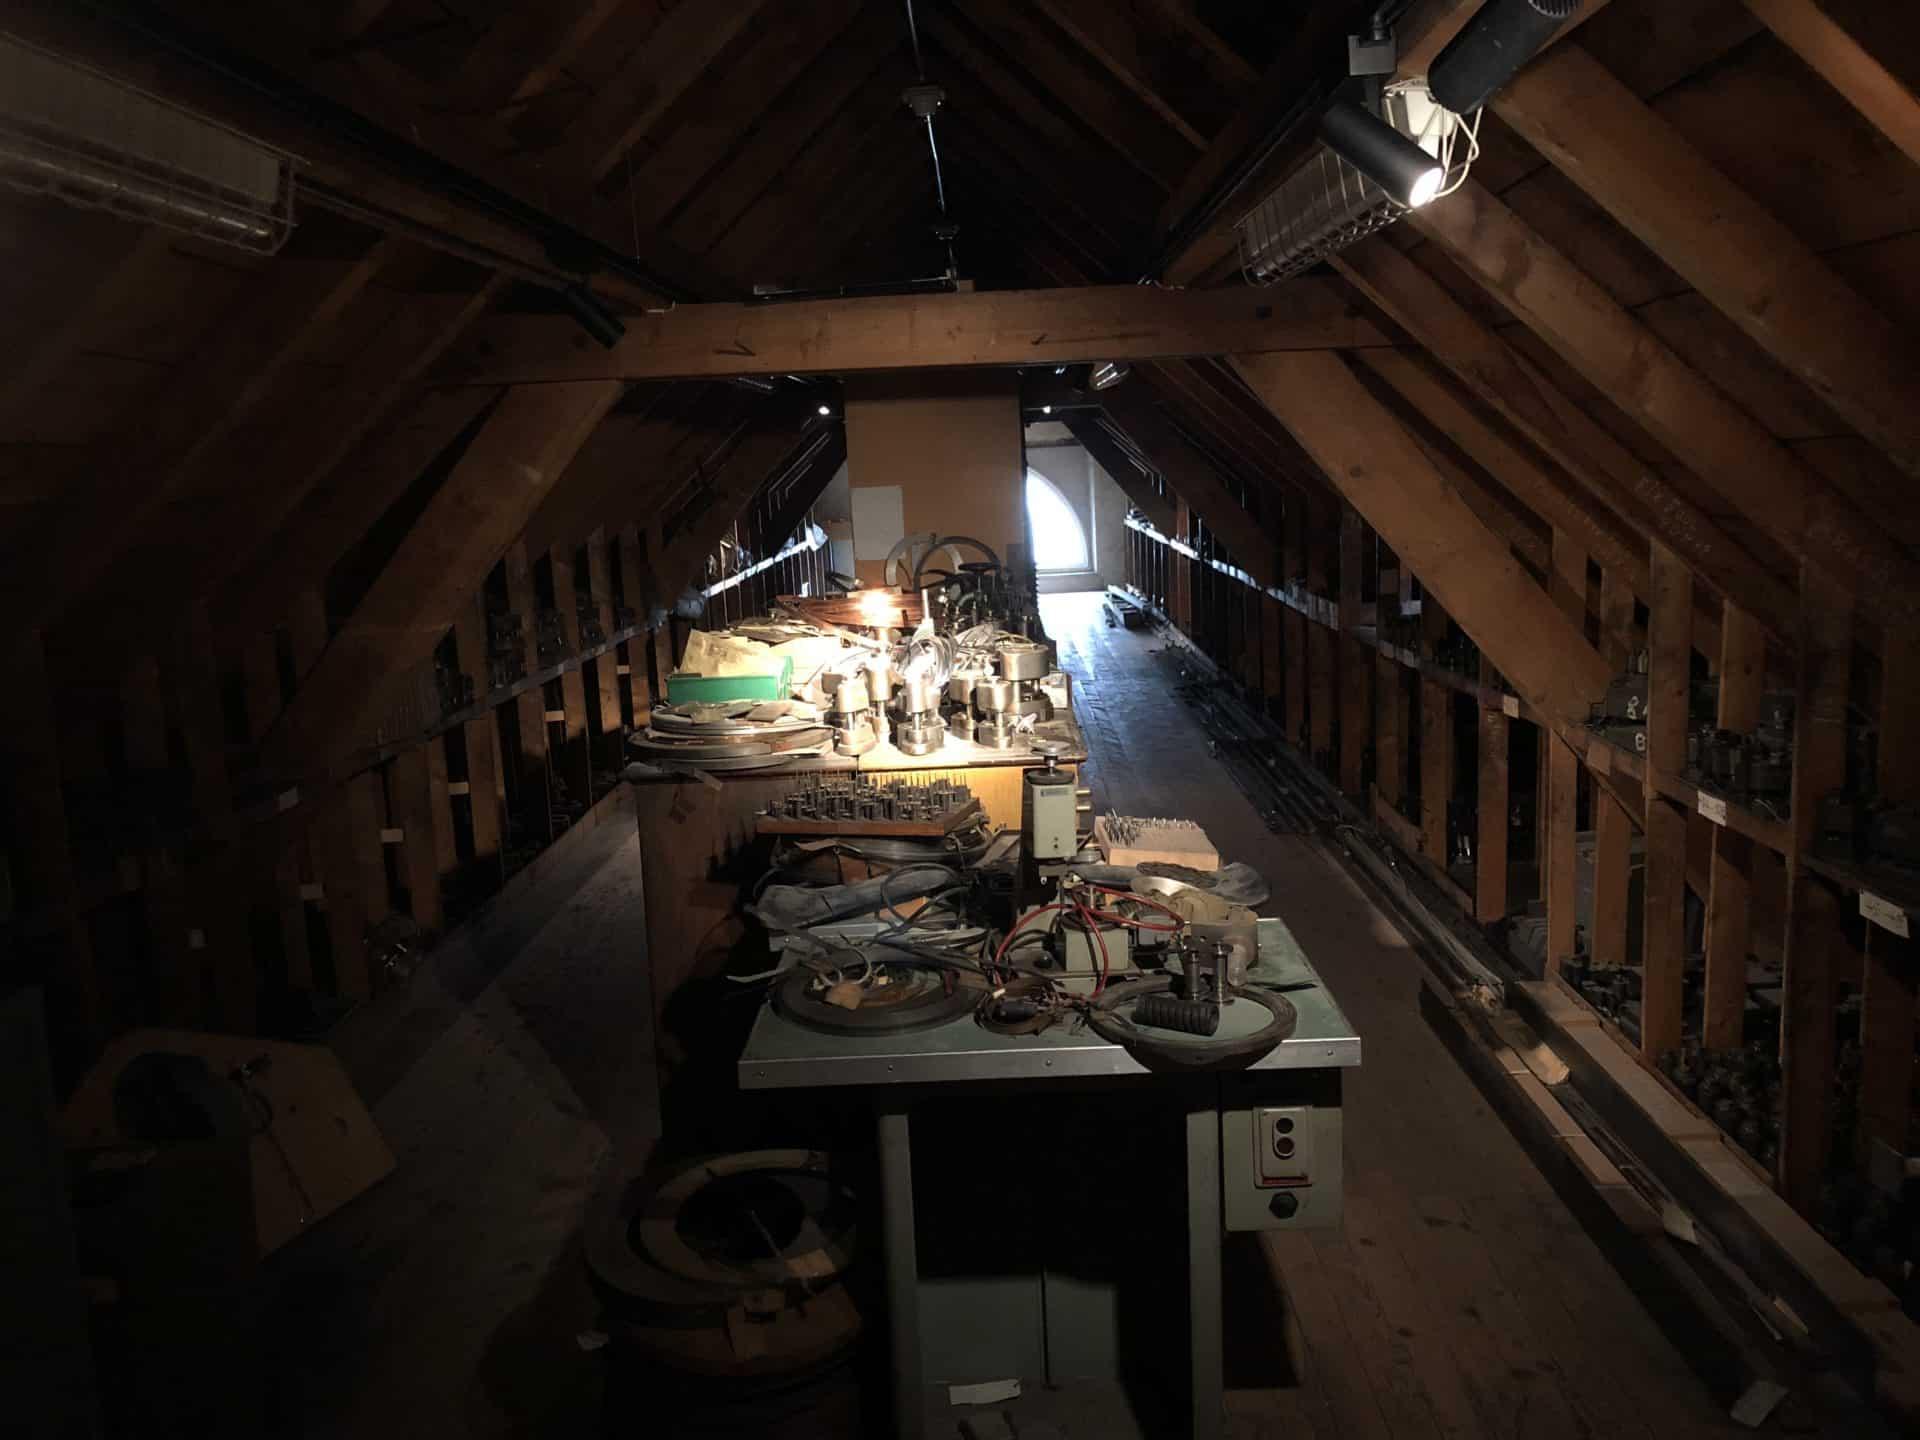 Zenith Dachboden Versteck El Primero